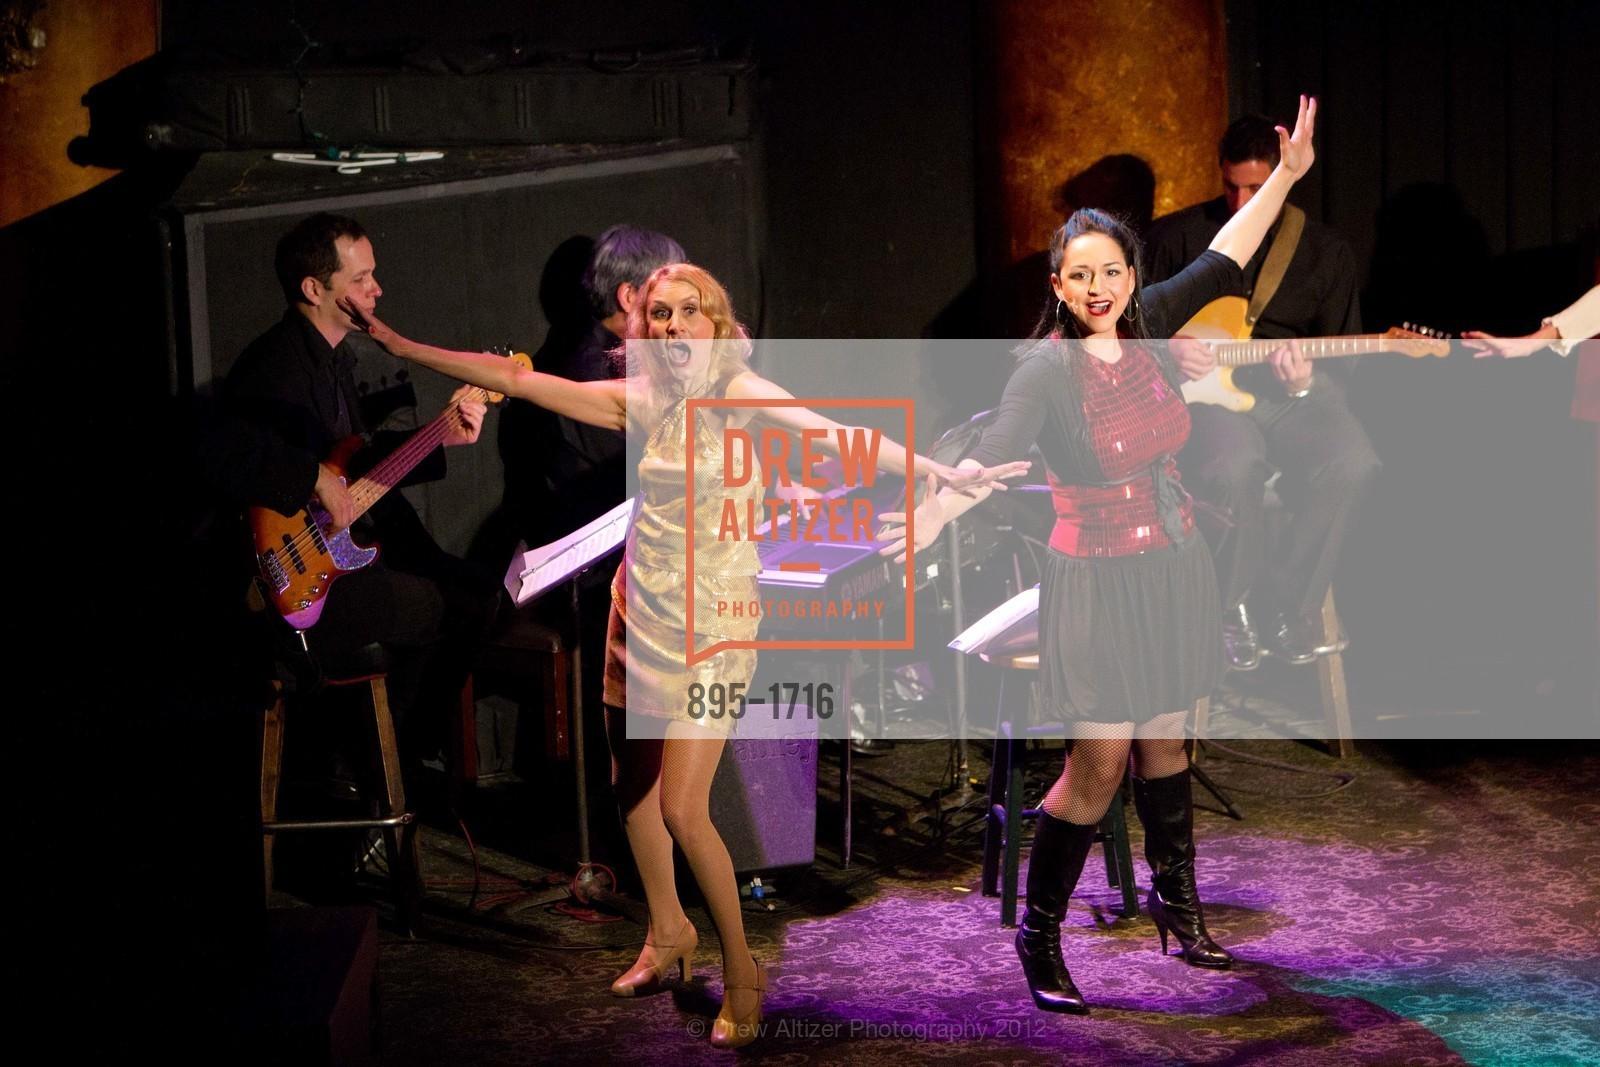 Performance, Photo #895-1716